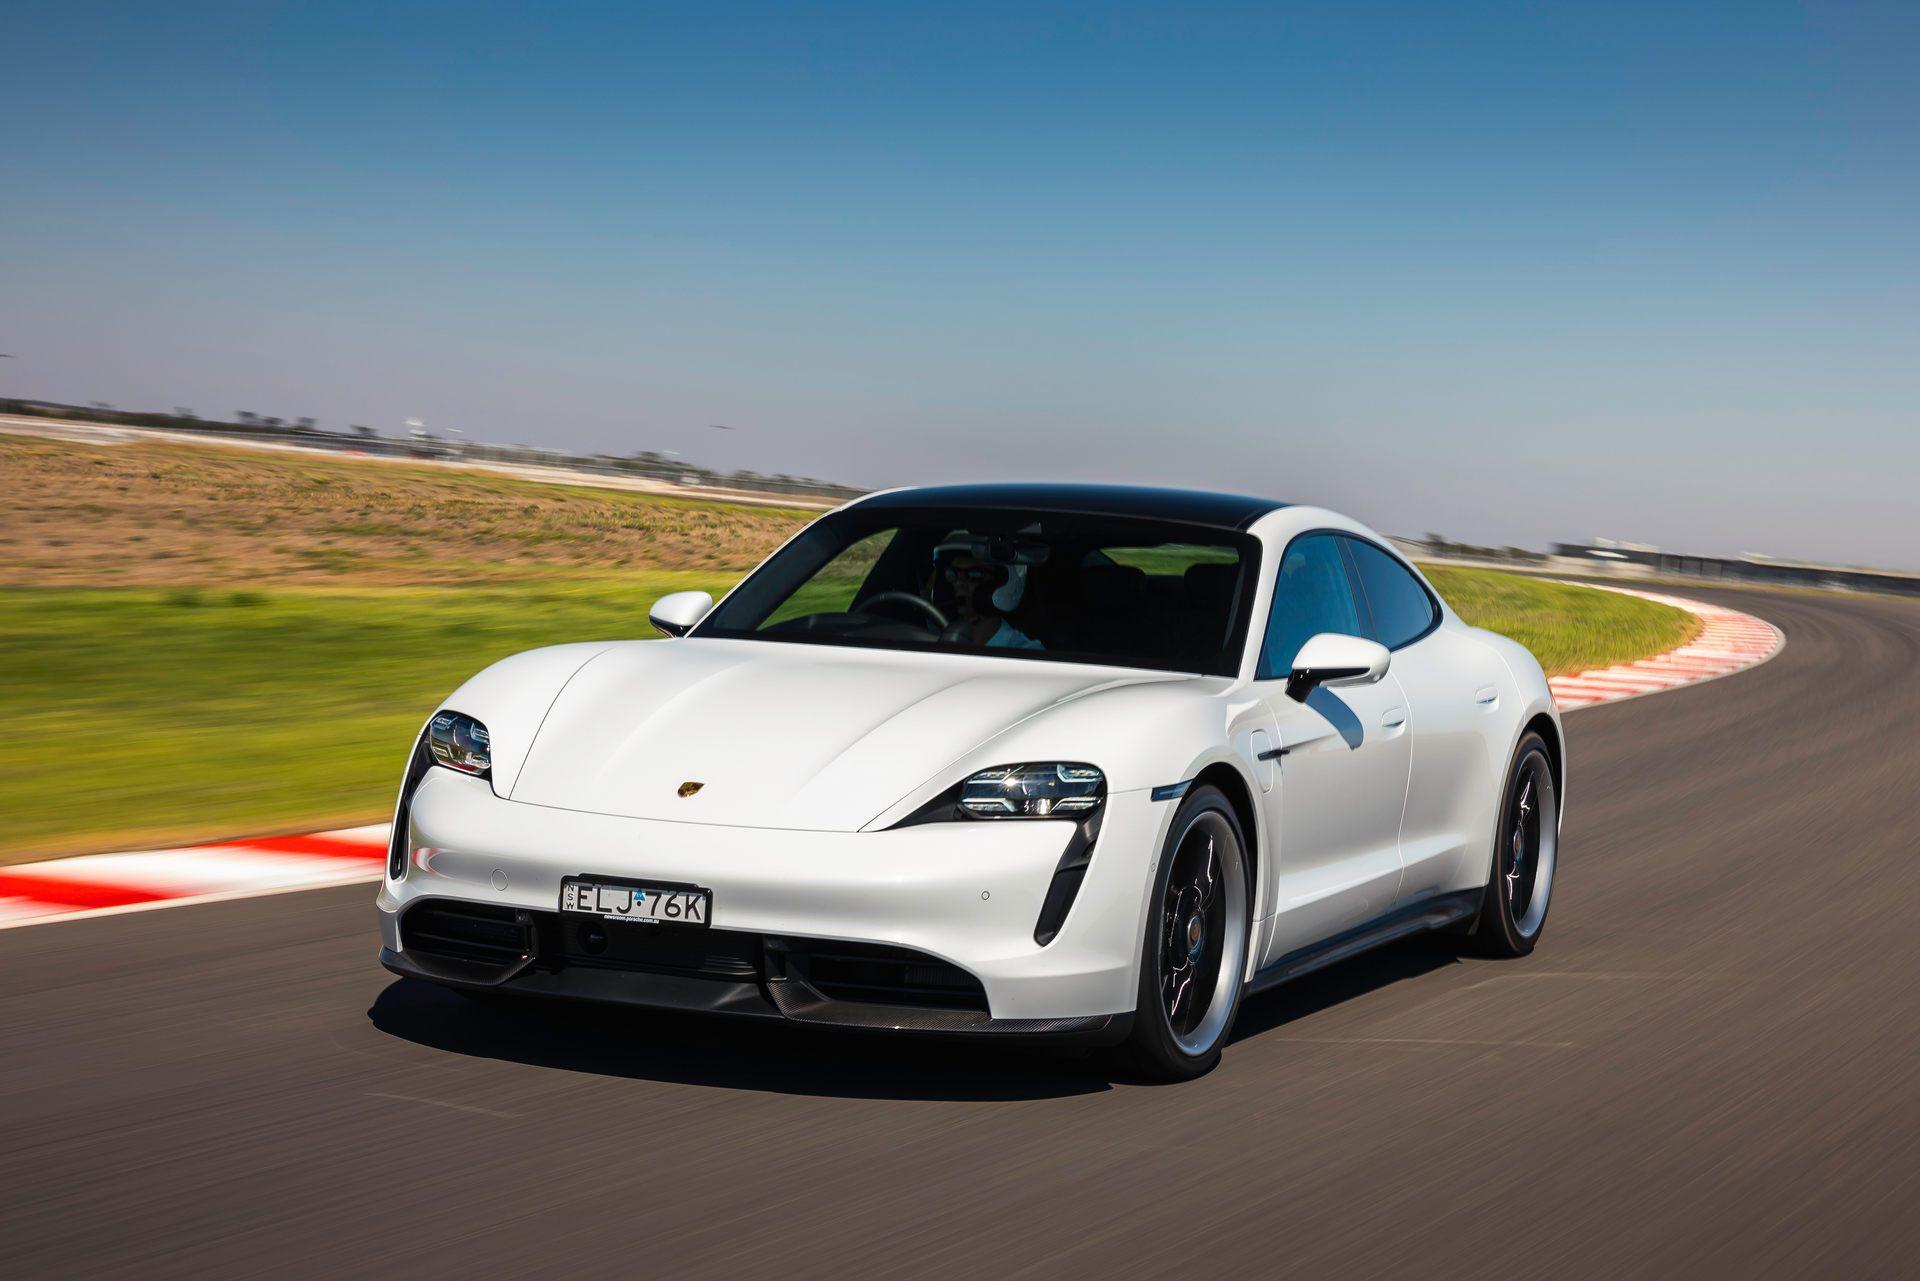 Porsche-Taycan-Turbo-S-The-Bend-Motorsport-Park-46